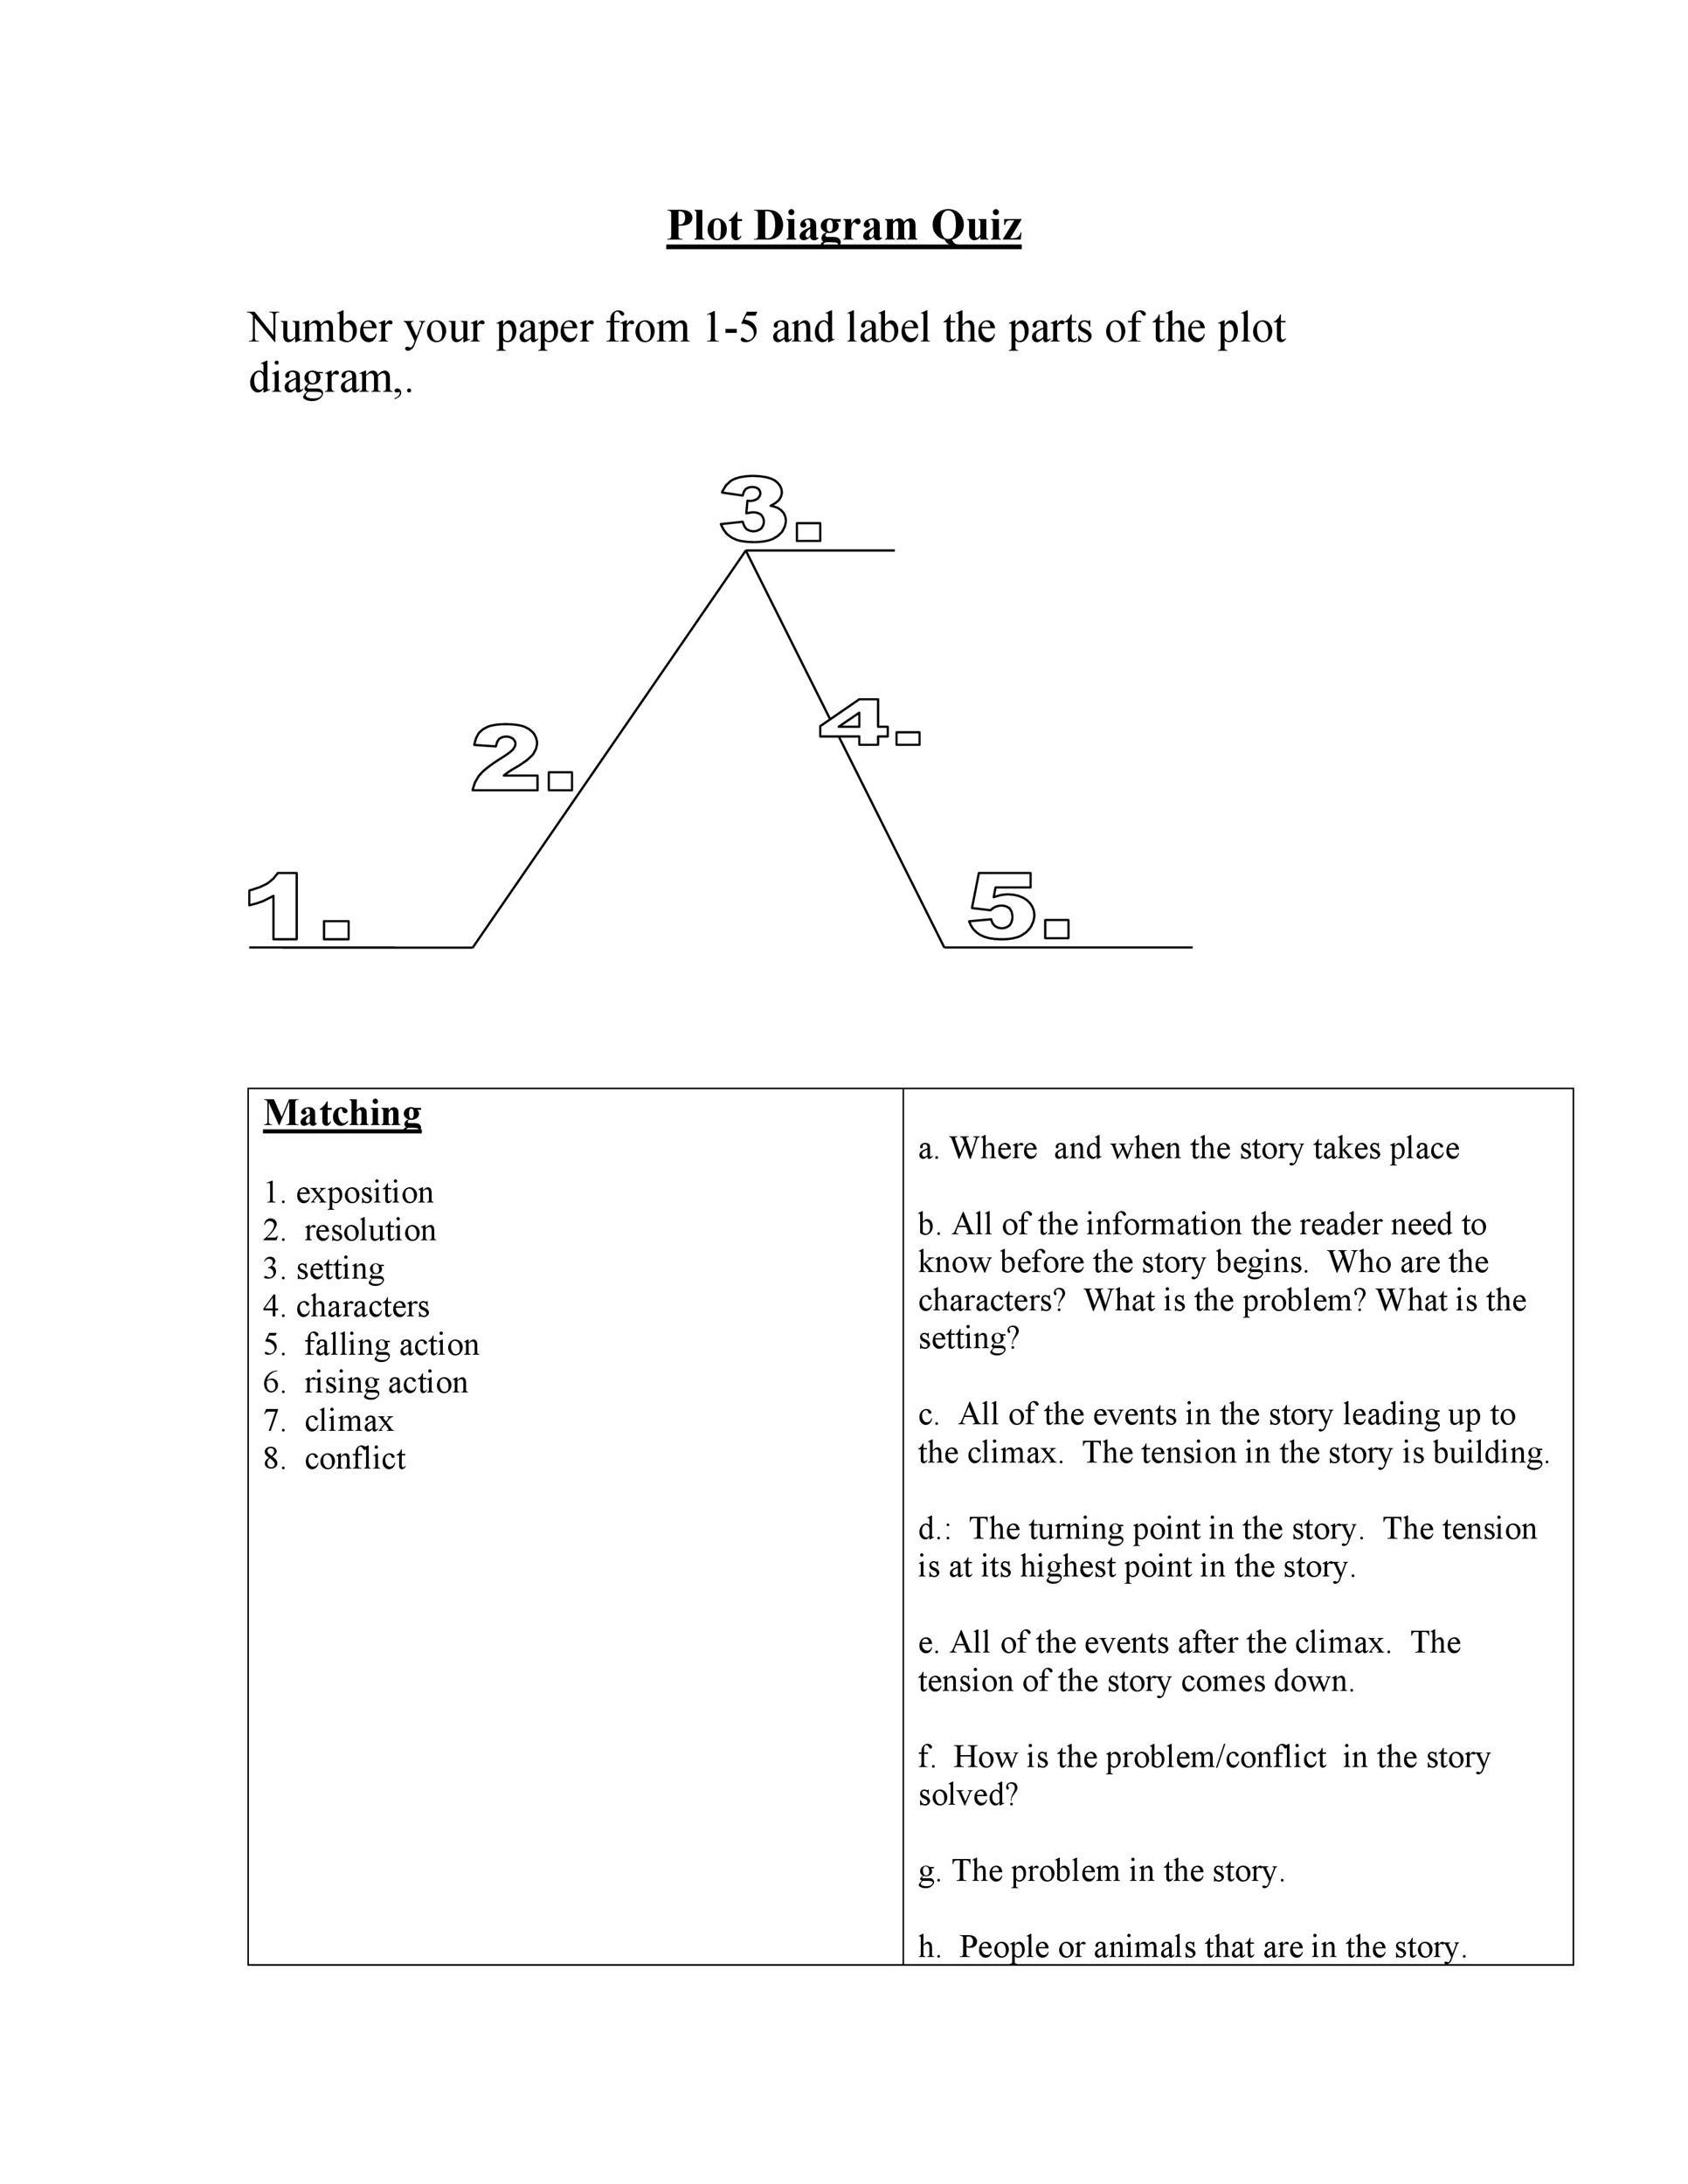 45 Professional Plot Diagram Templates (Plot Pyramid) ᐅ TemplateLabTemplateLab